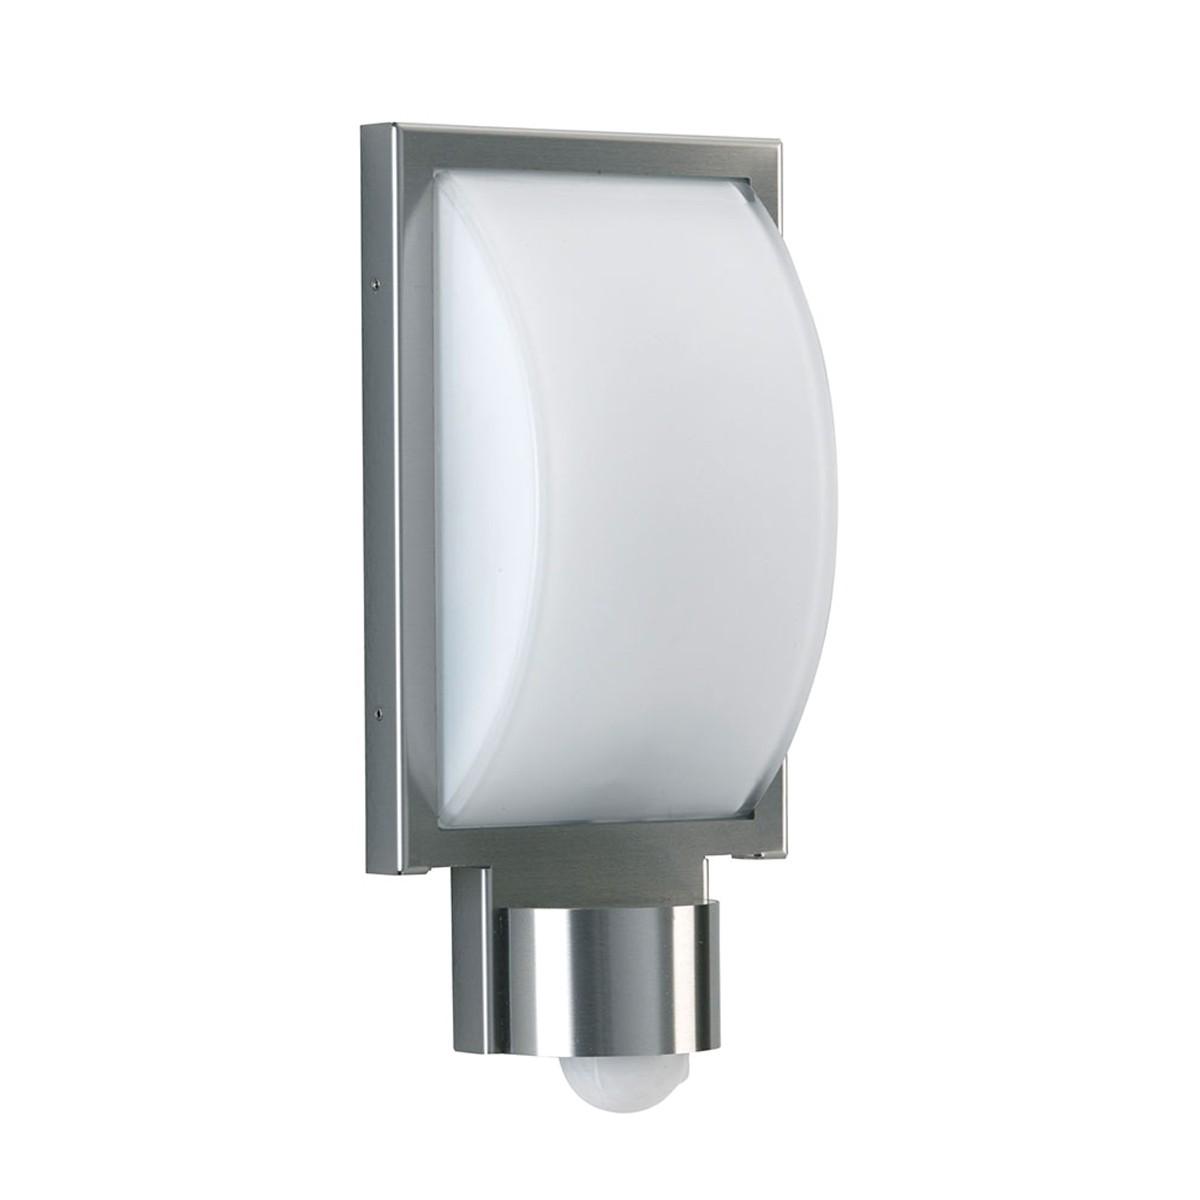 Albert 696383 LED Wandleuchte mit Bewegungsmelder, Edelstahl